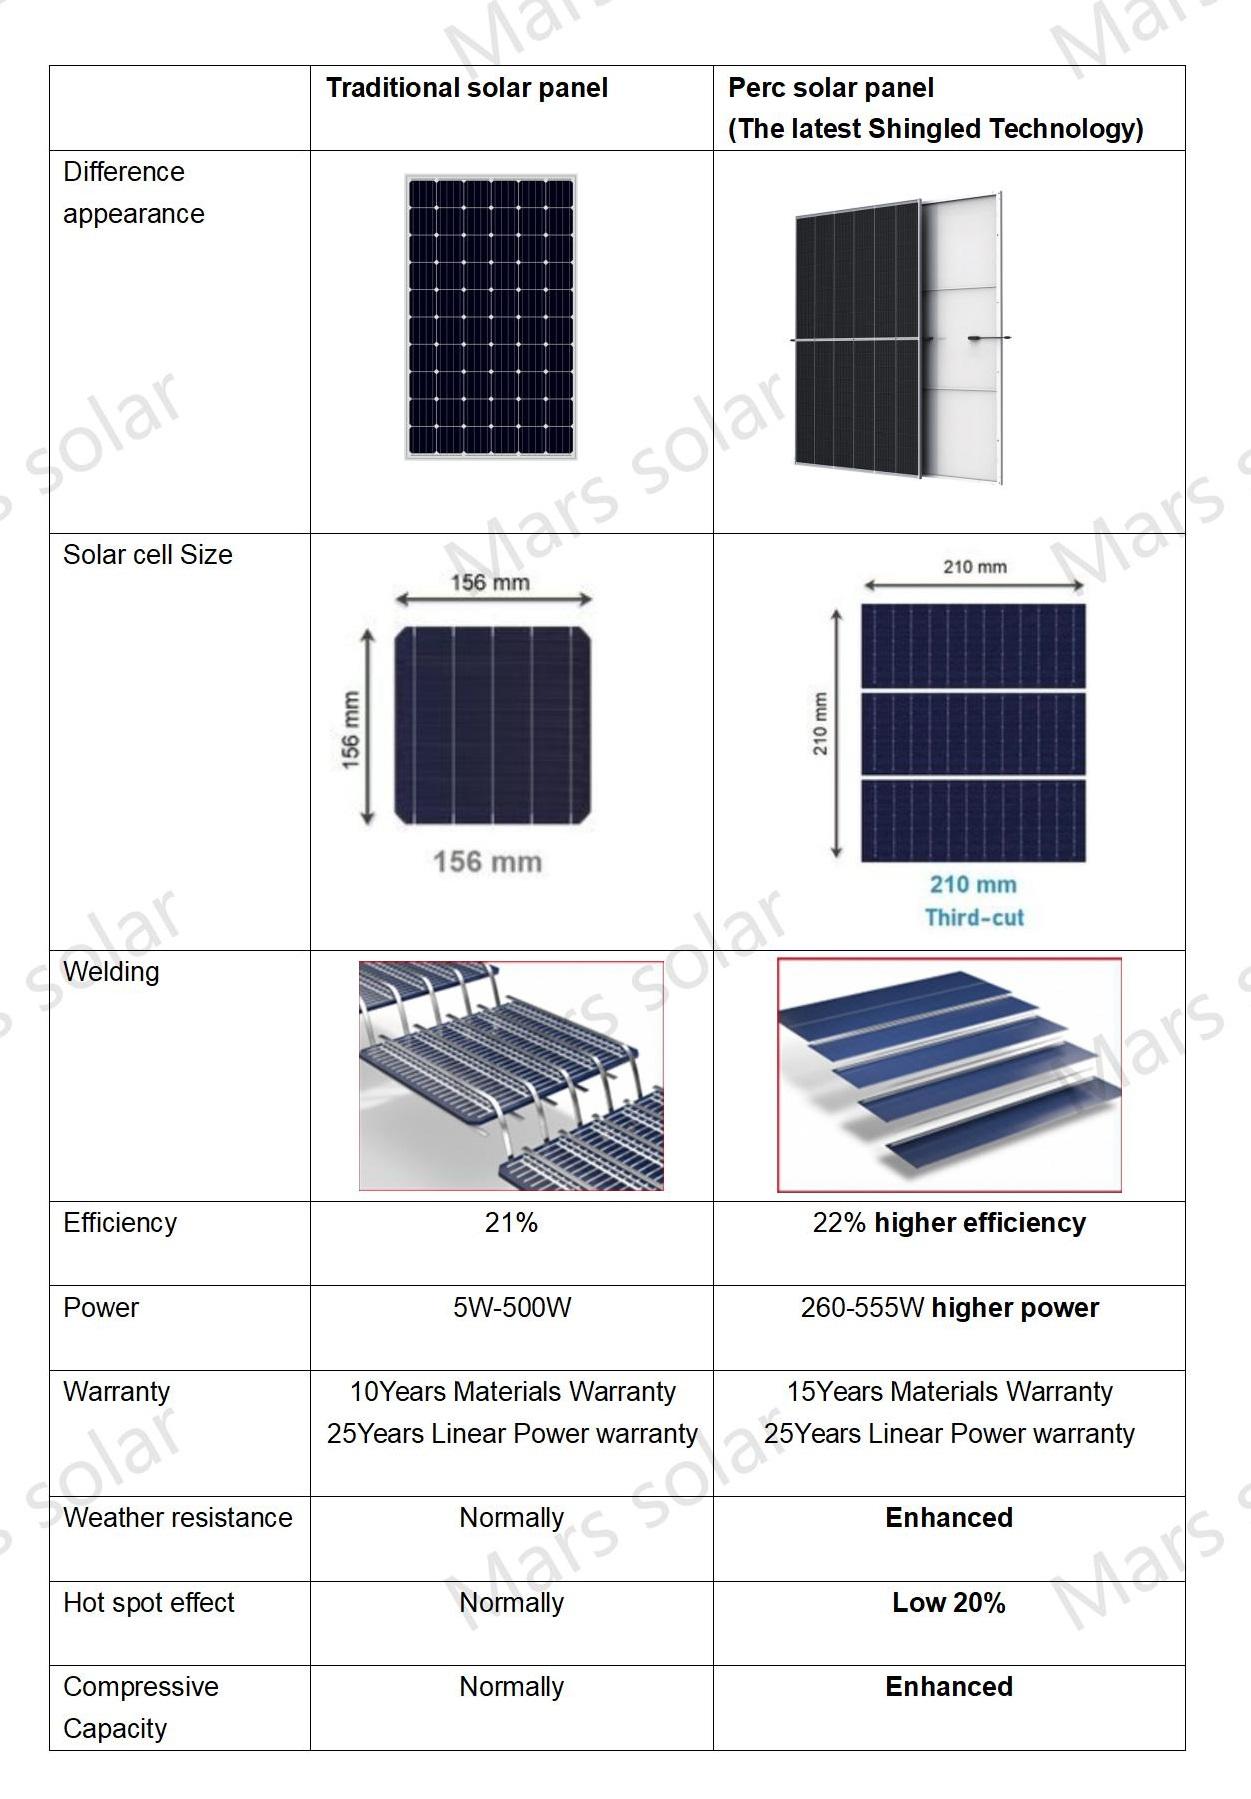 Perc solar panel